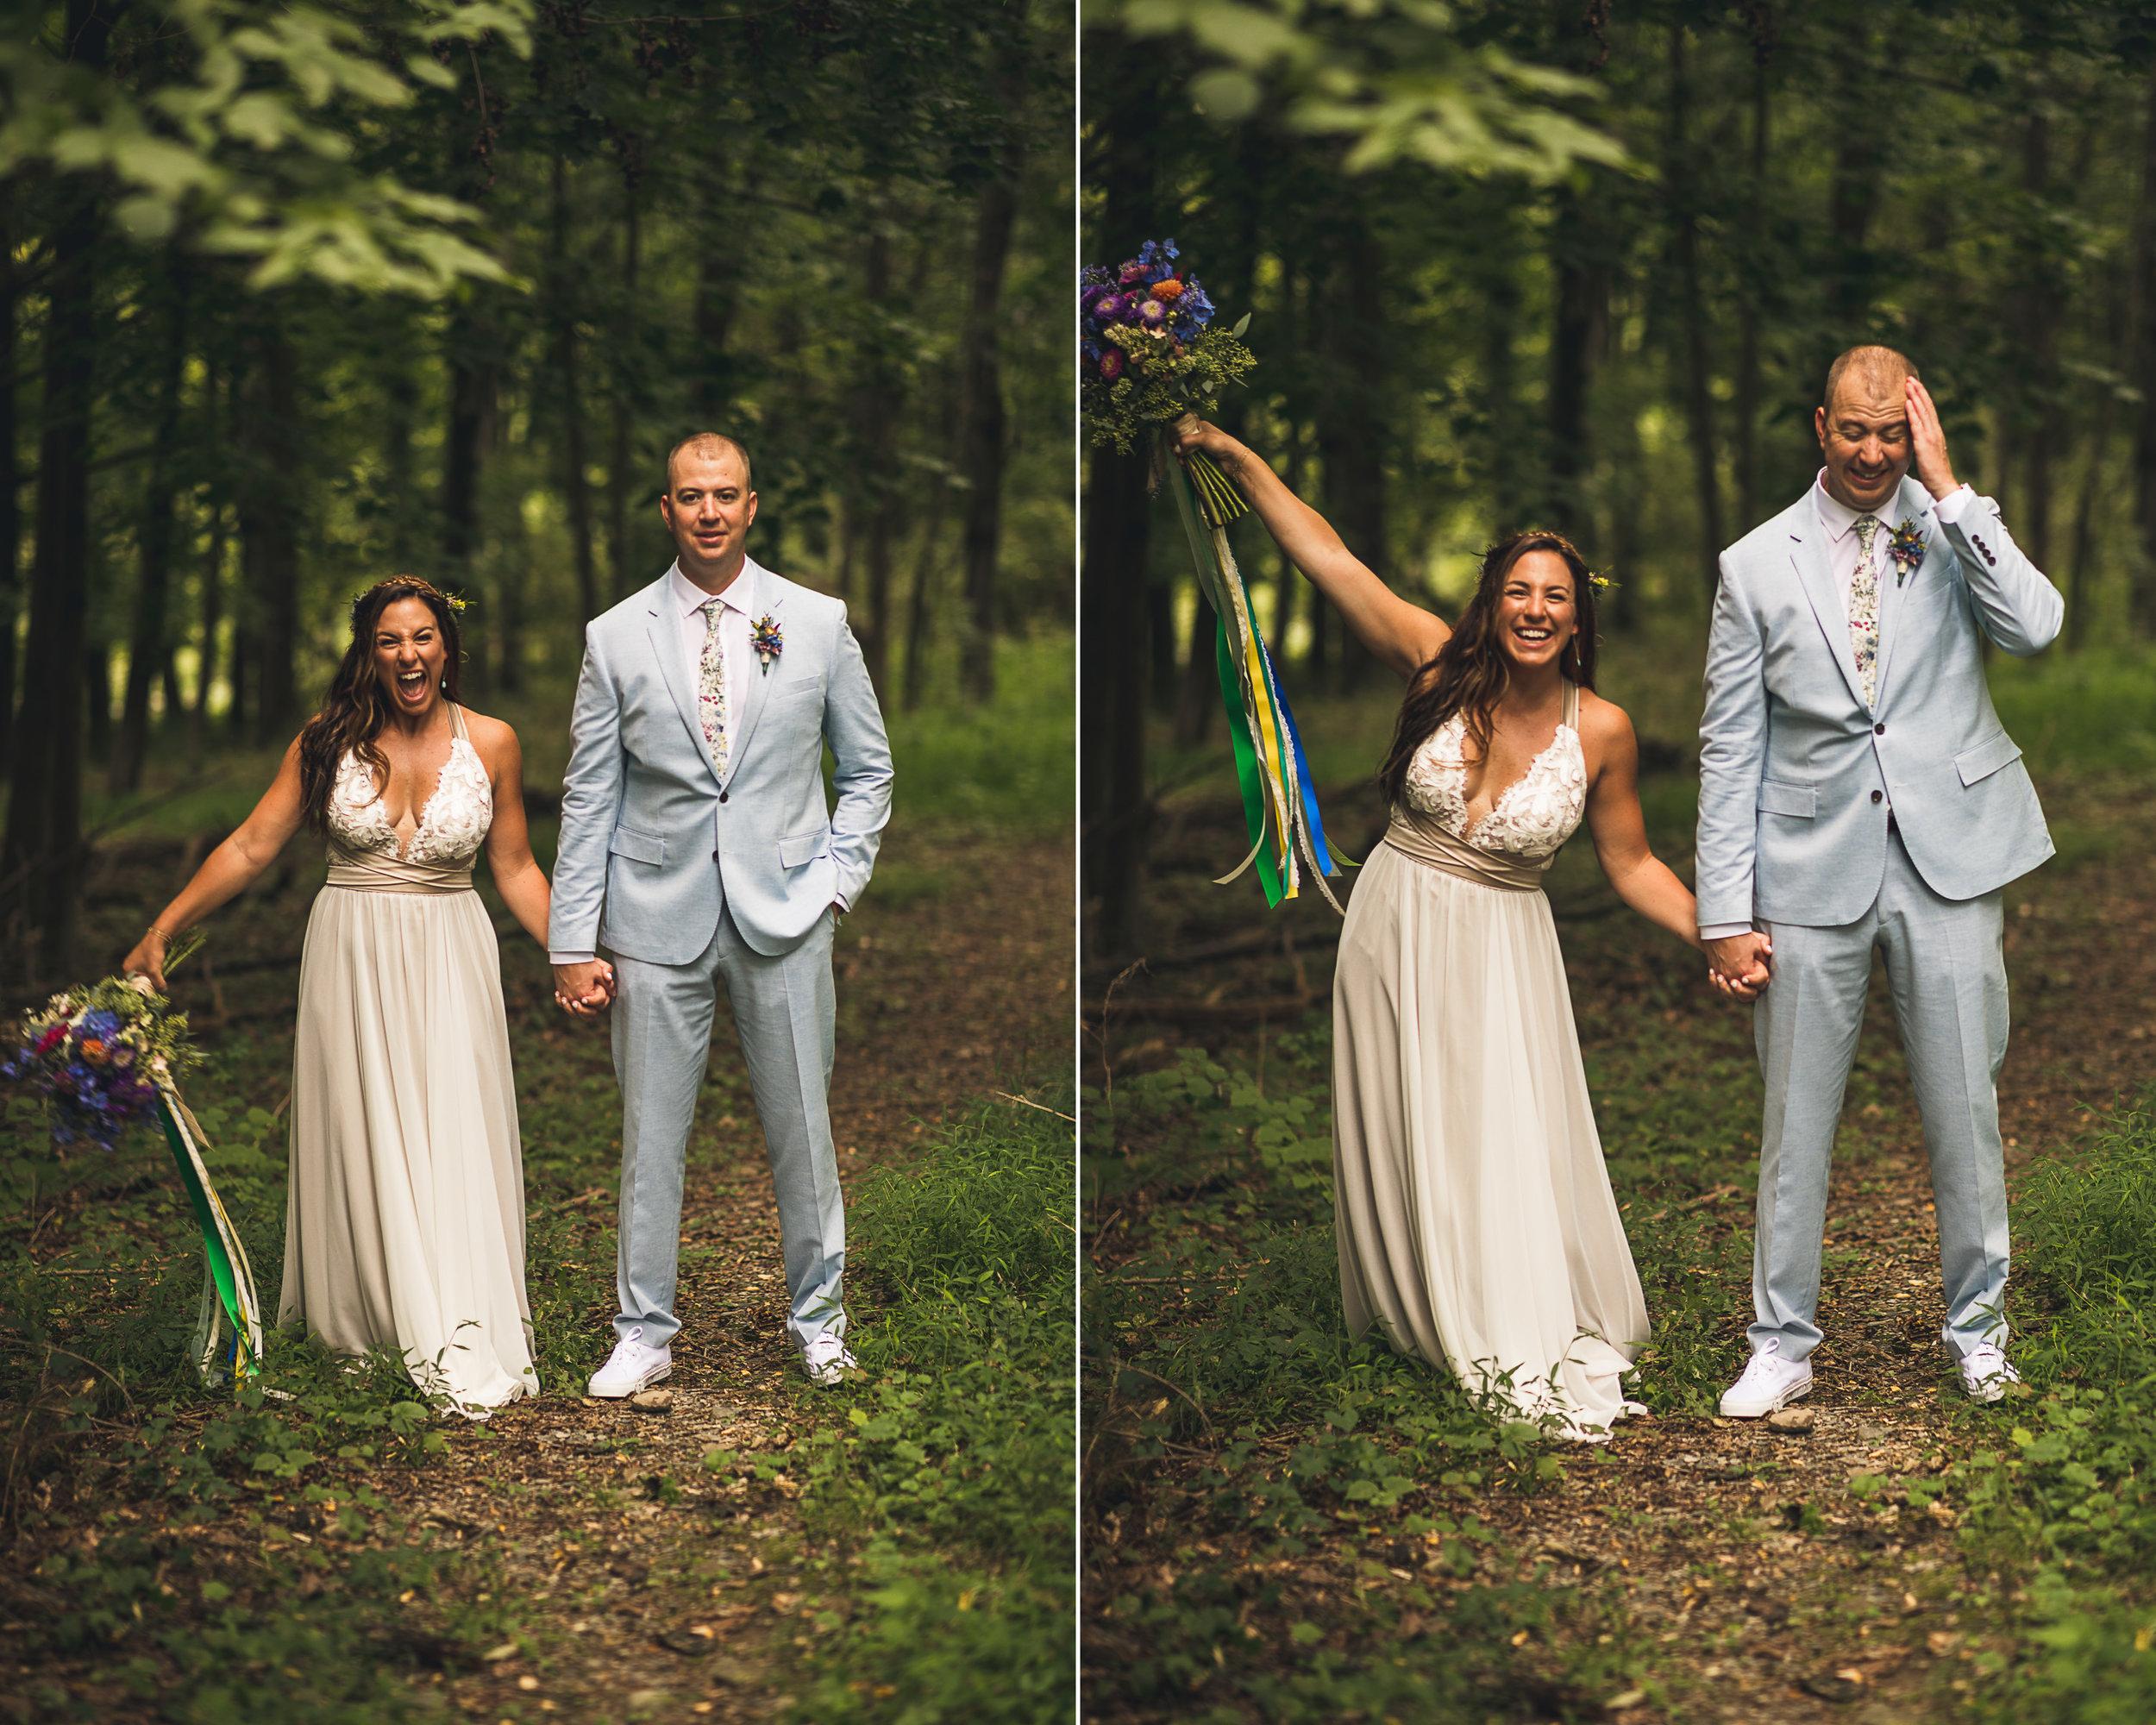 millrace-pond-rustic-wedding-22.jpg